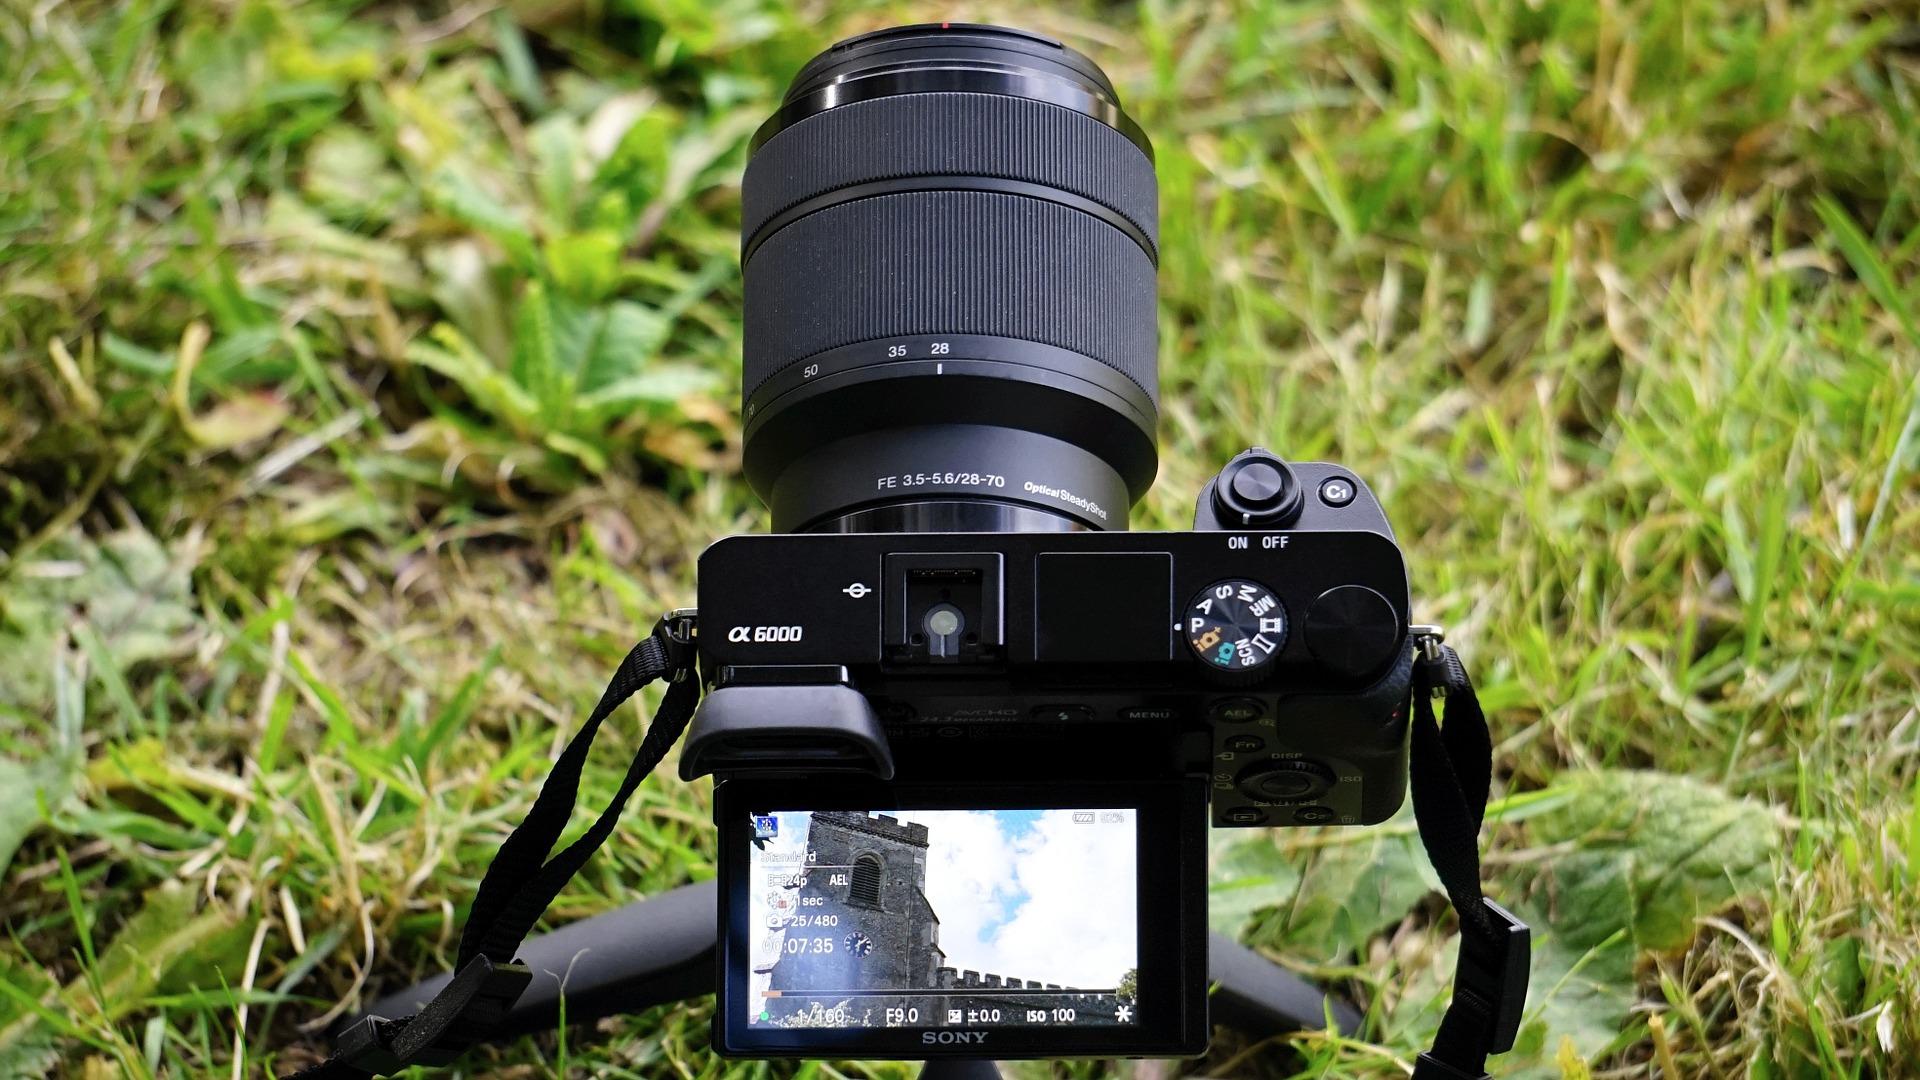 camera-1495669_1920